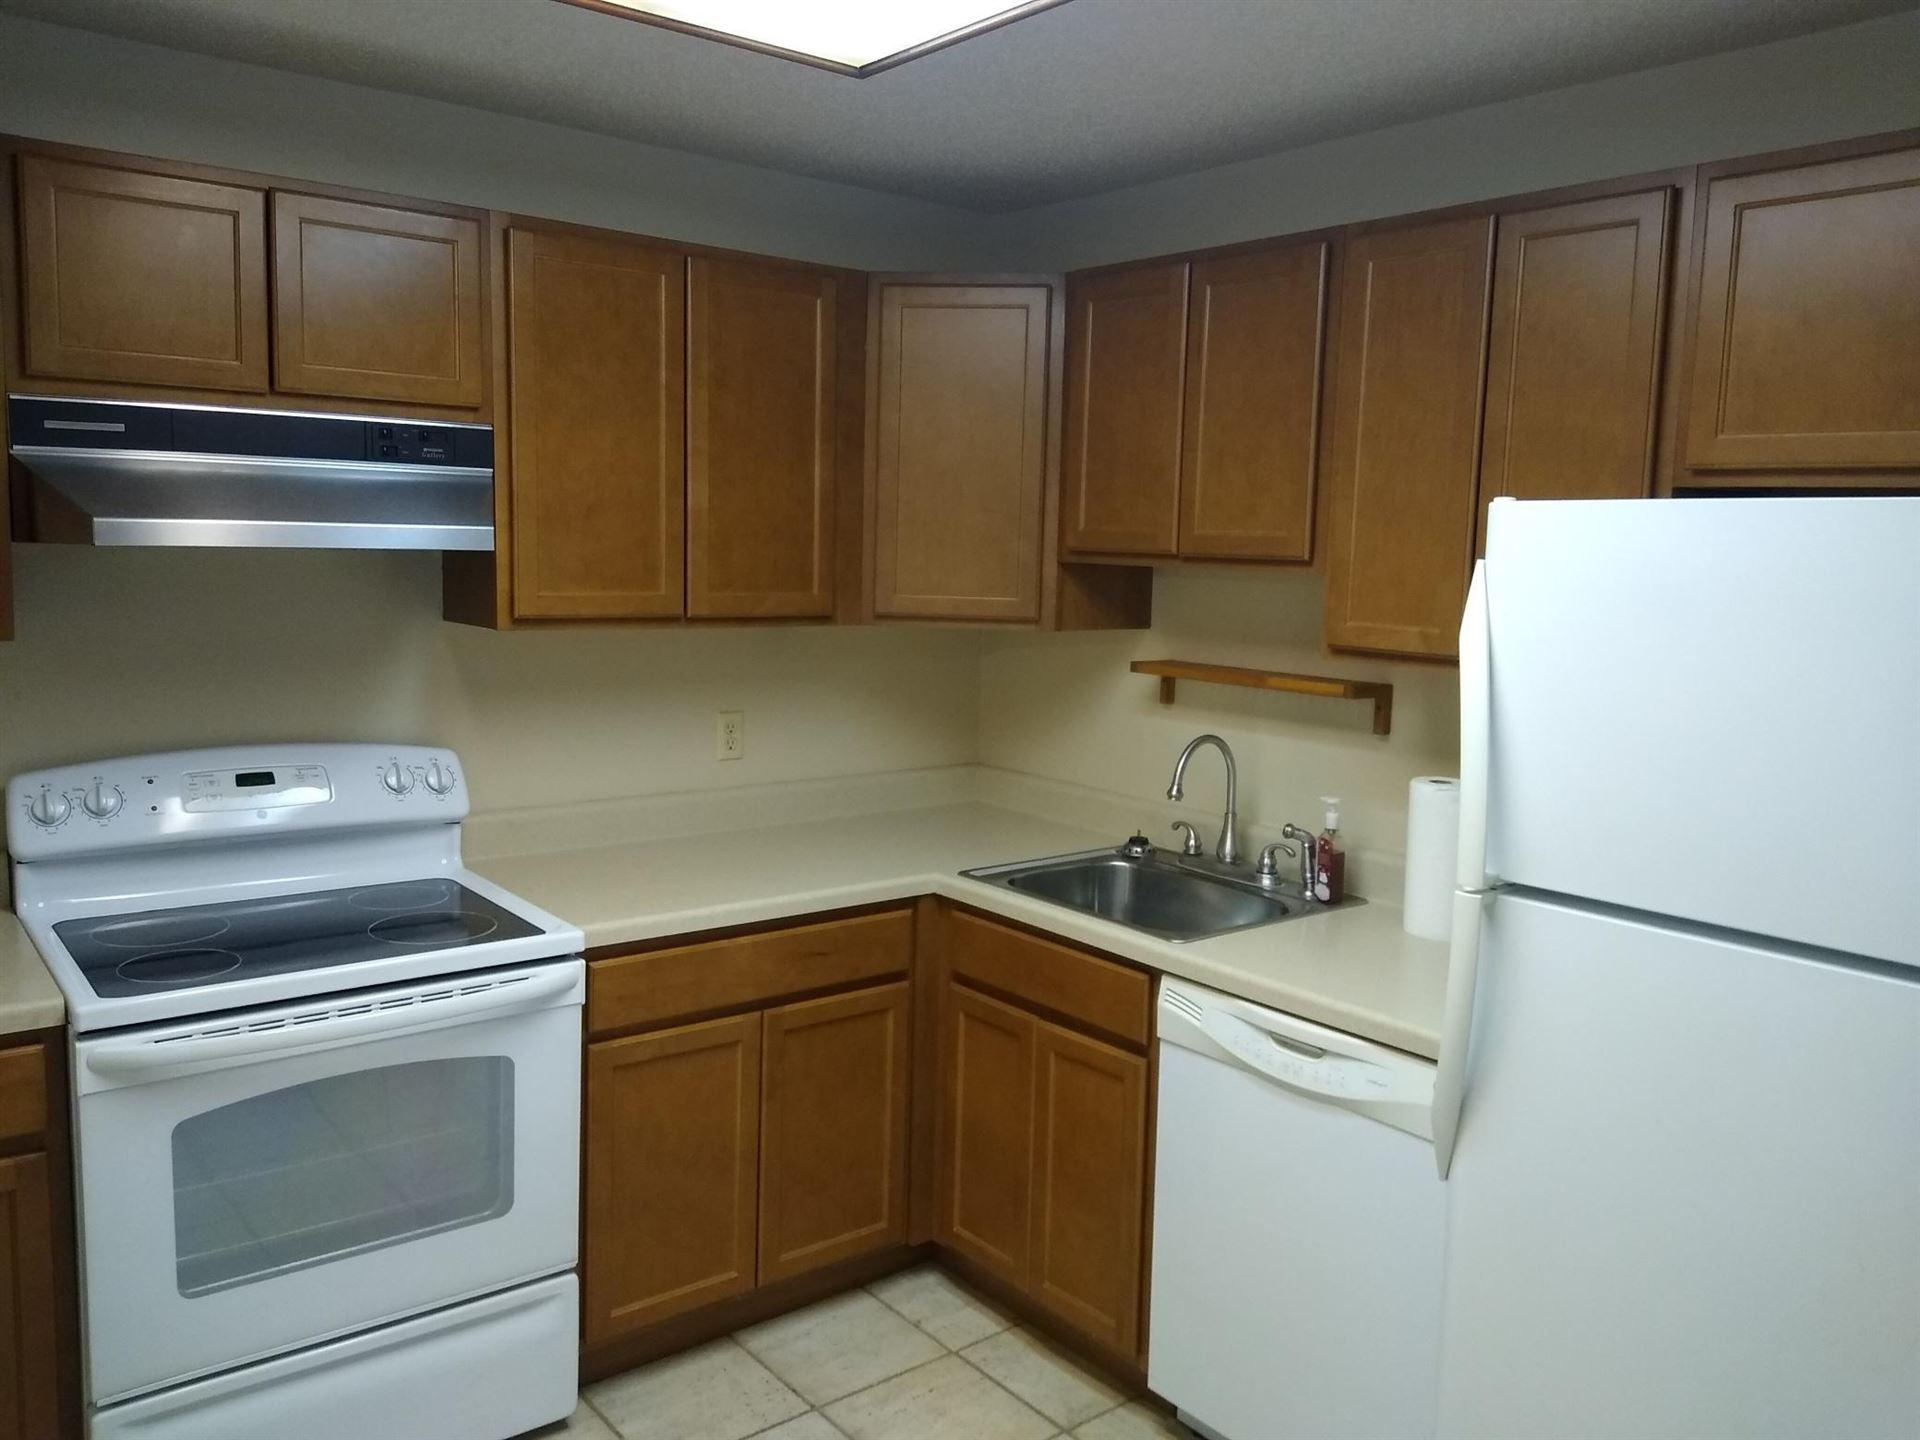 Photo of 1700 Four Oaks Road #255, Eagan, MN 55121 (MLS # 5699437)